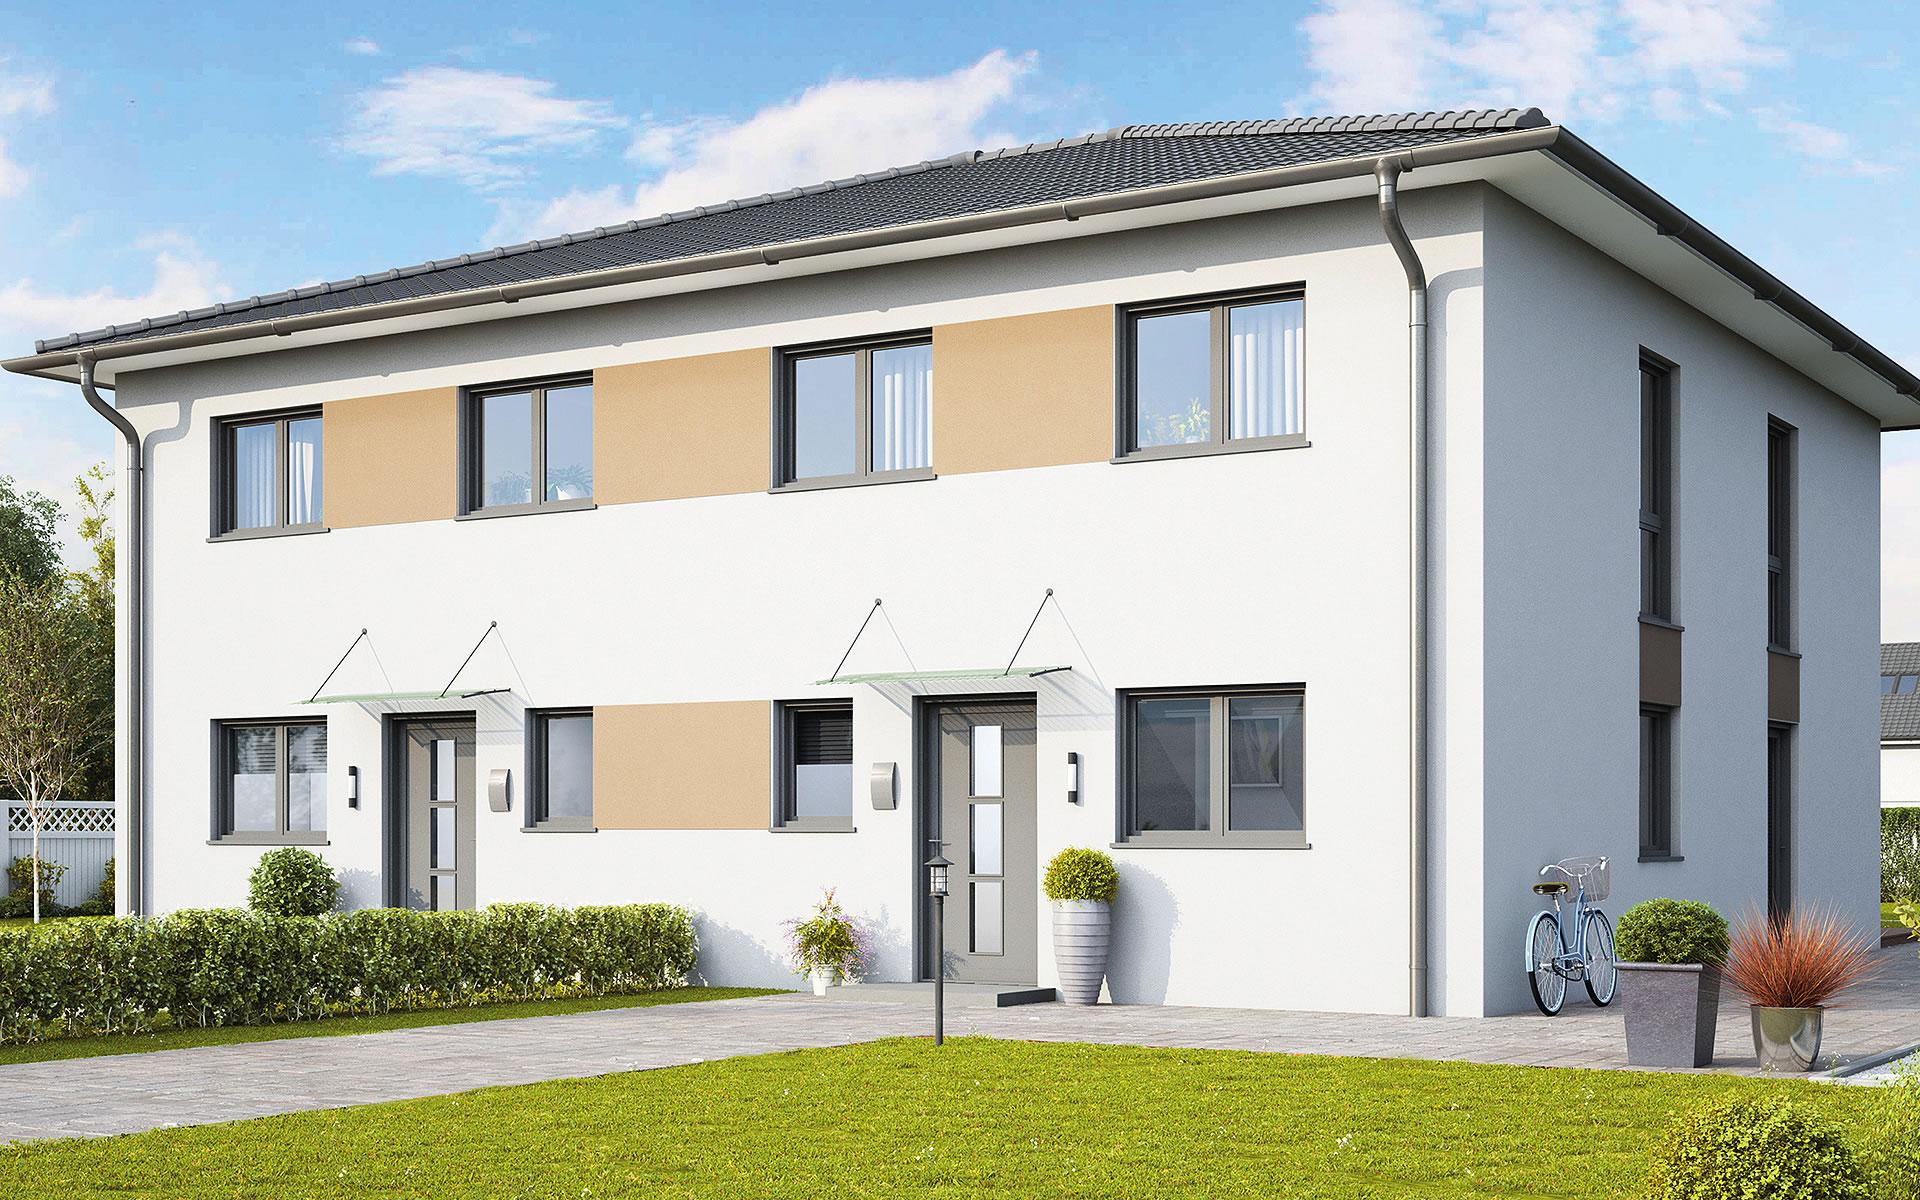 Dublin-Variante von HELMA Eigenheimbau AG